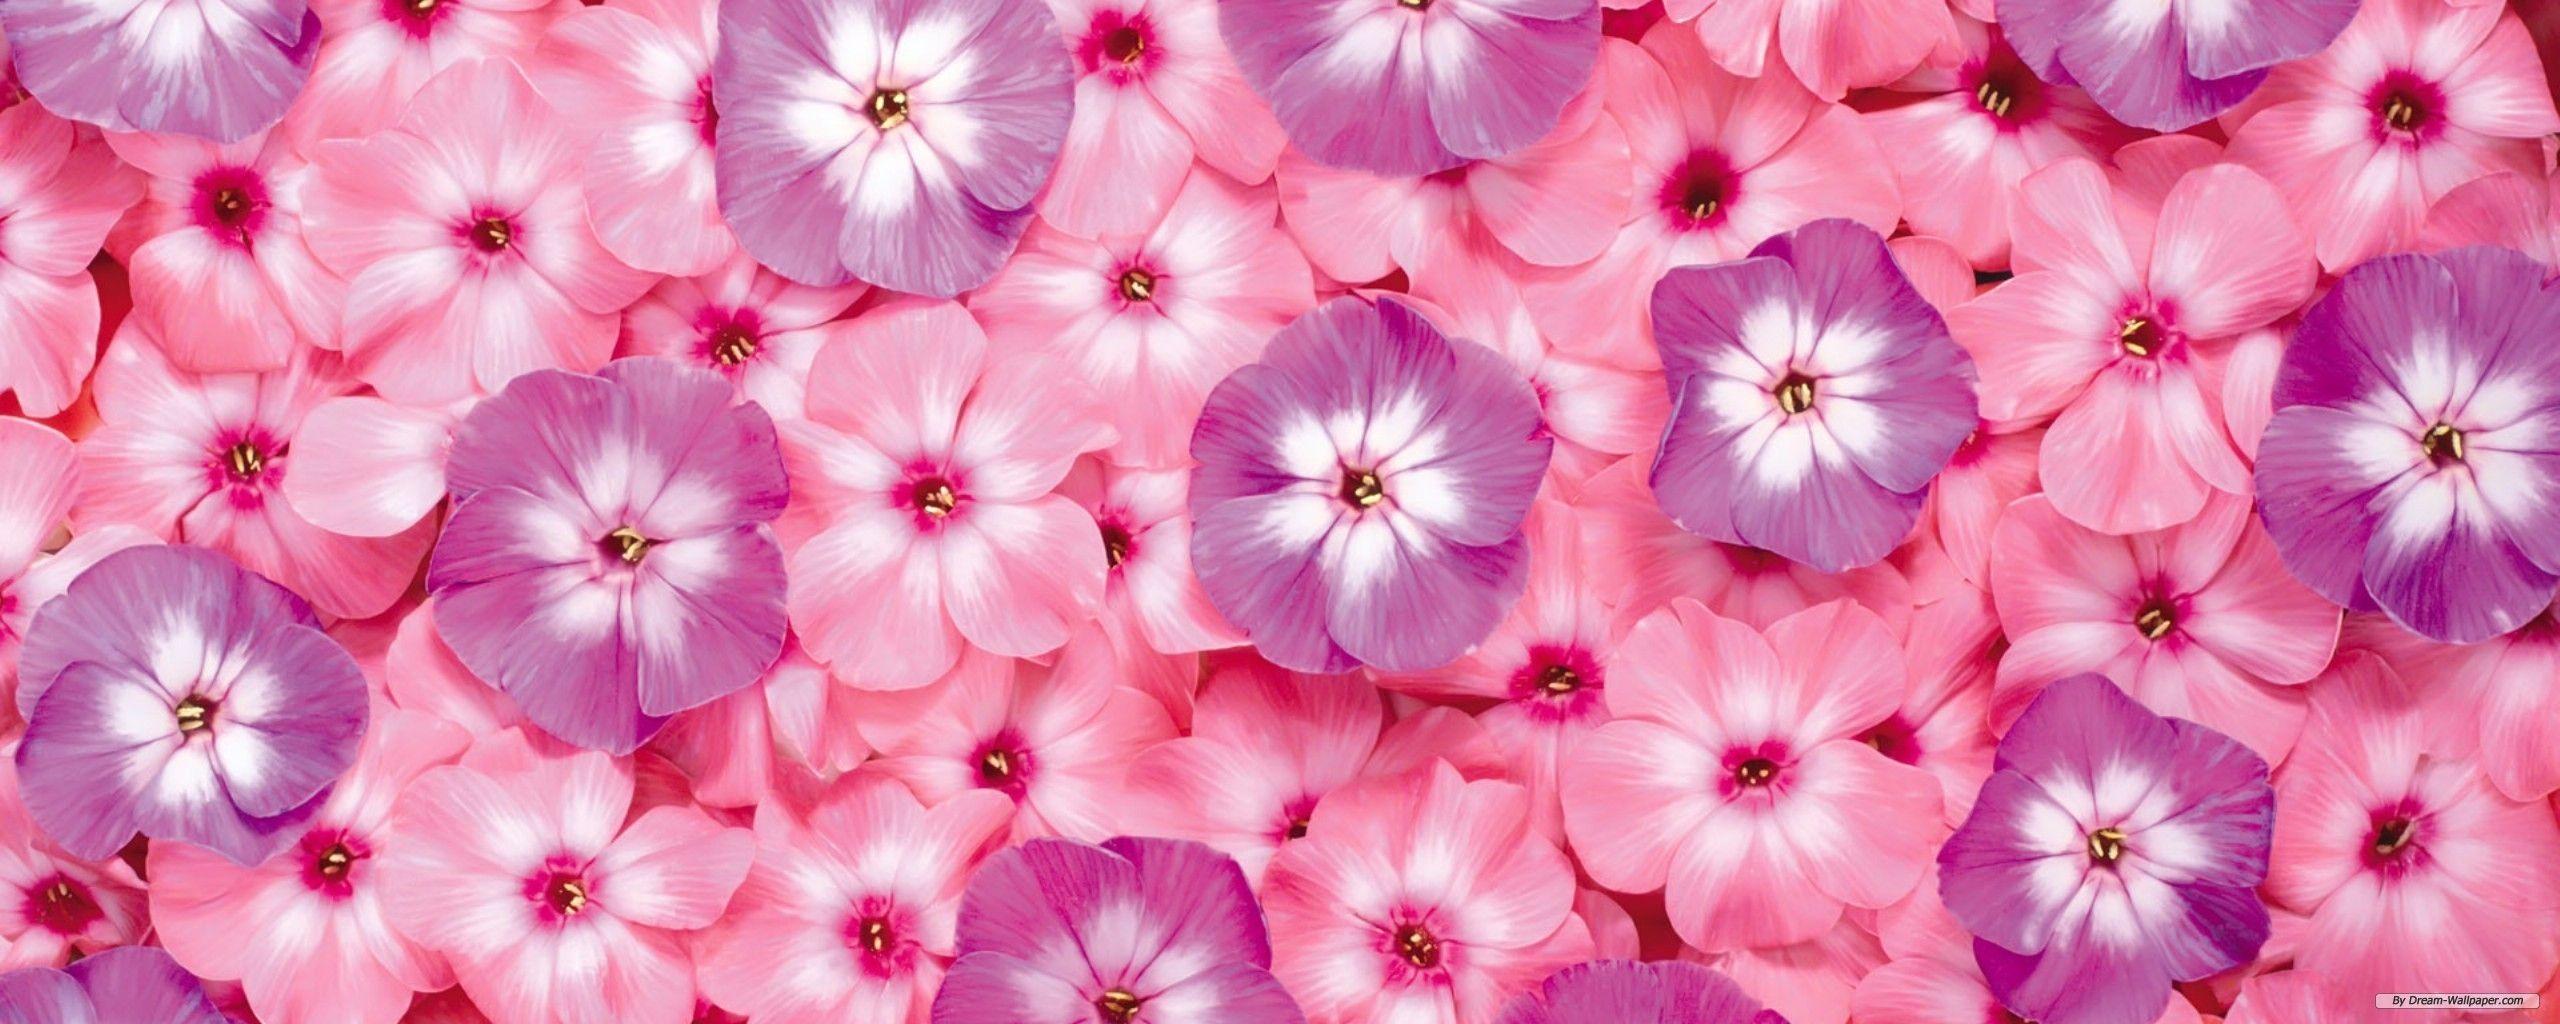 Tumblr iphone wallpaper purple - Iphone Flower Backgrounds Group 1280 800 Tumblr Flower Wallpapers 40 Wallpapers Adorable